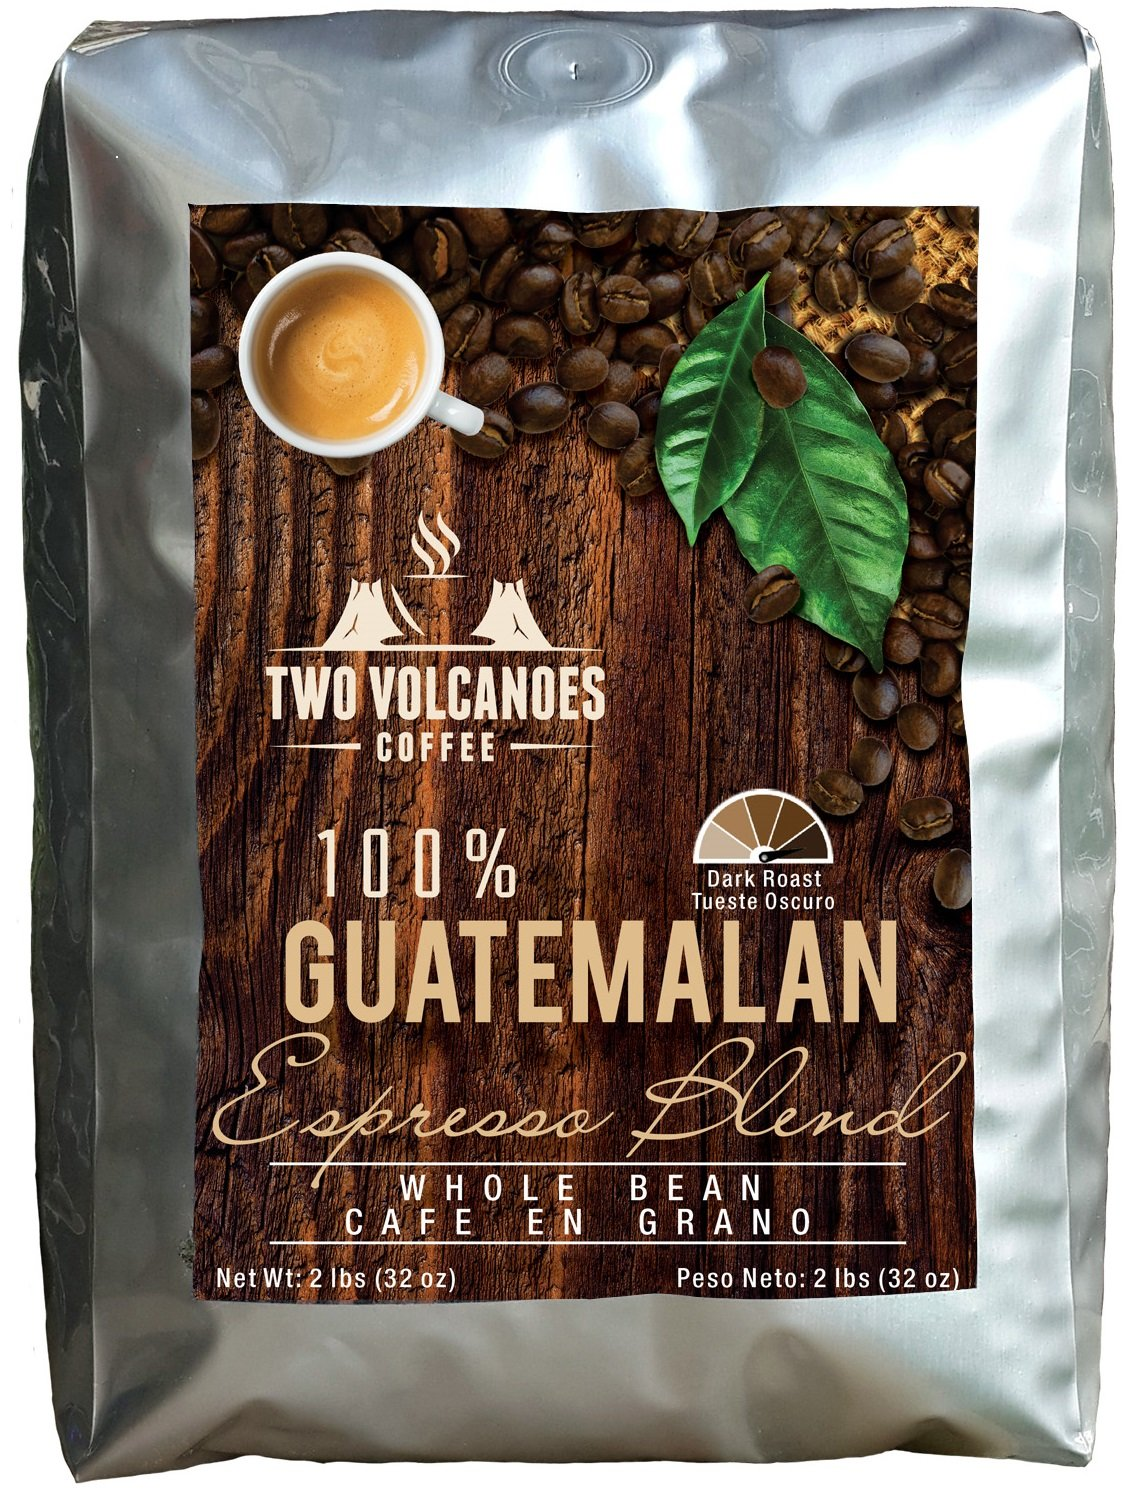 Two Volcanoes Espresso Coffee Beans - 2 Lbs - Guatemala Dark Roast Espresso Blend Whole Bean Coffee - Rare Single Origin Gourmet Beans. Get The Kick, Enjoy the Smoothness!